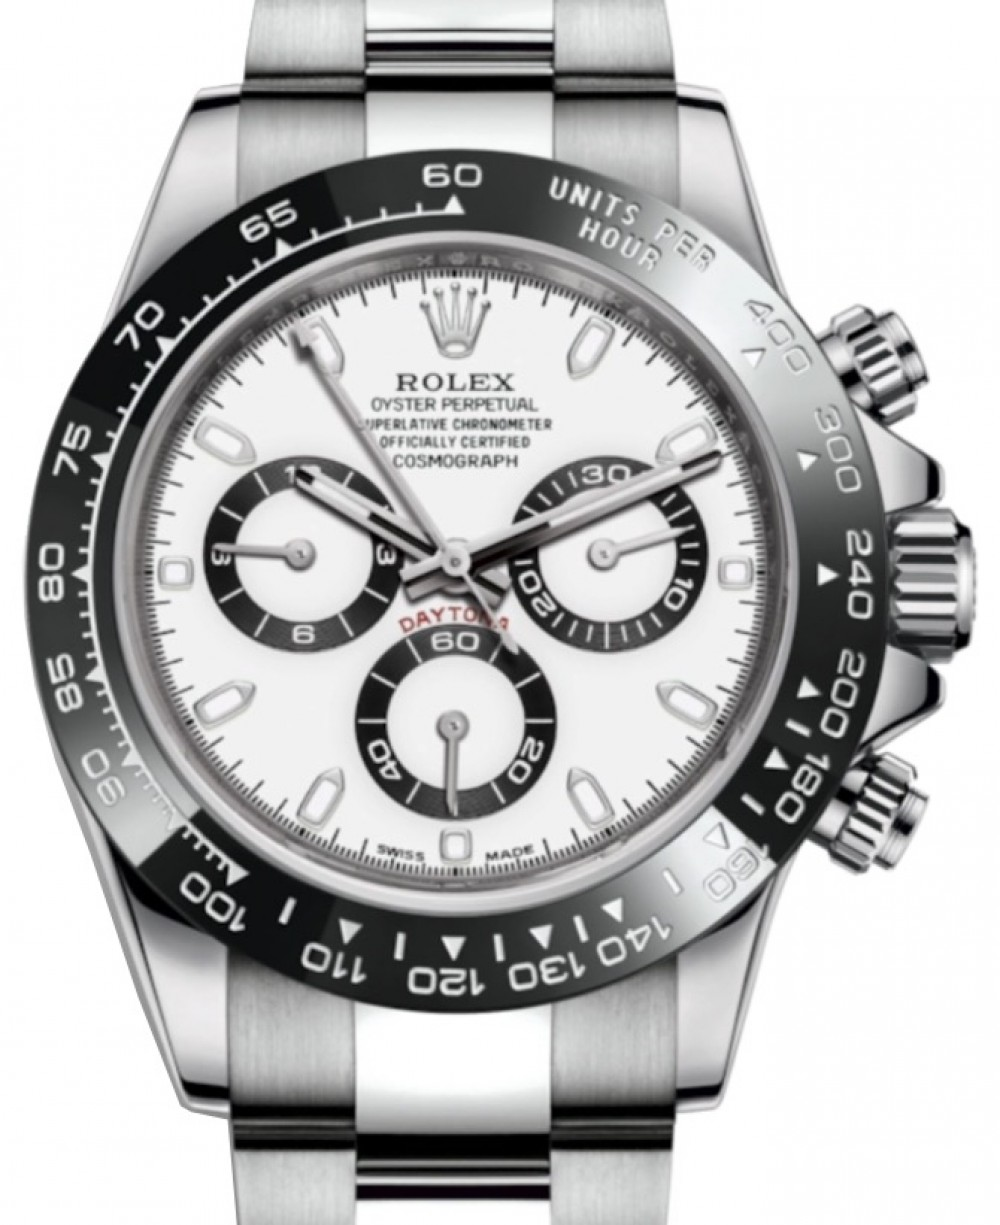 f8f663f3432f8 Rolex Cosmograph Daytona 116500LN 116500 40mm Black Cerachrom White ...